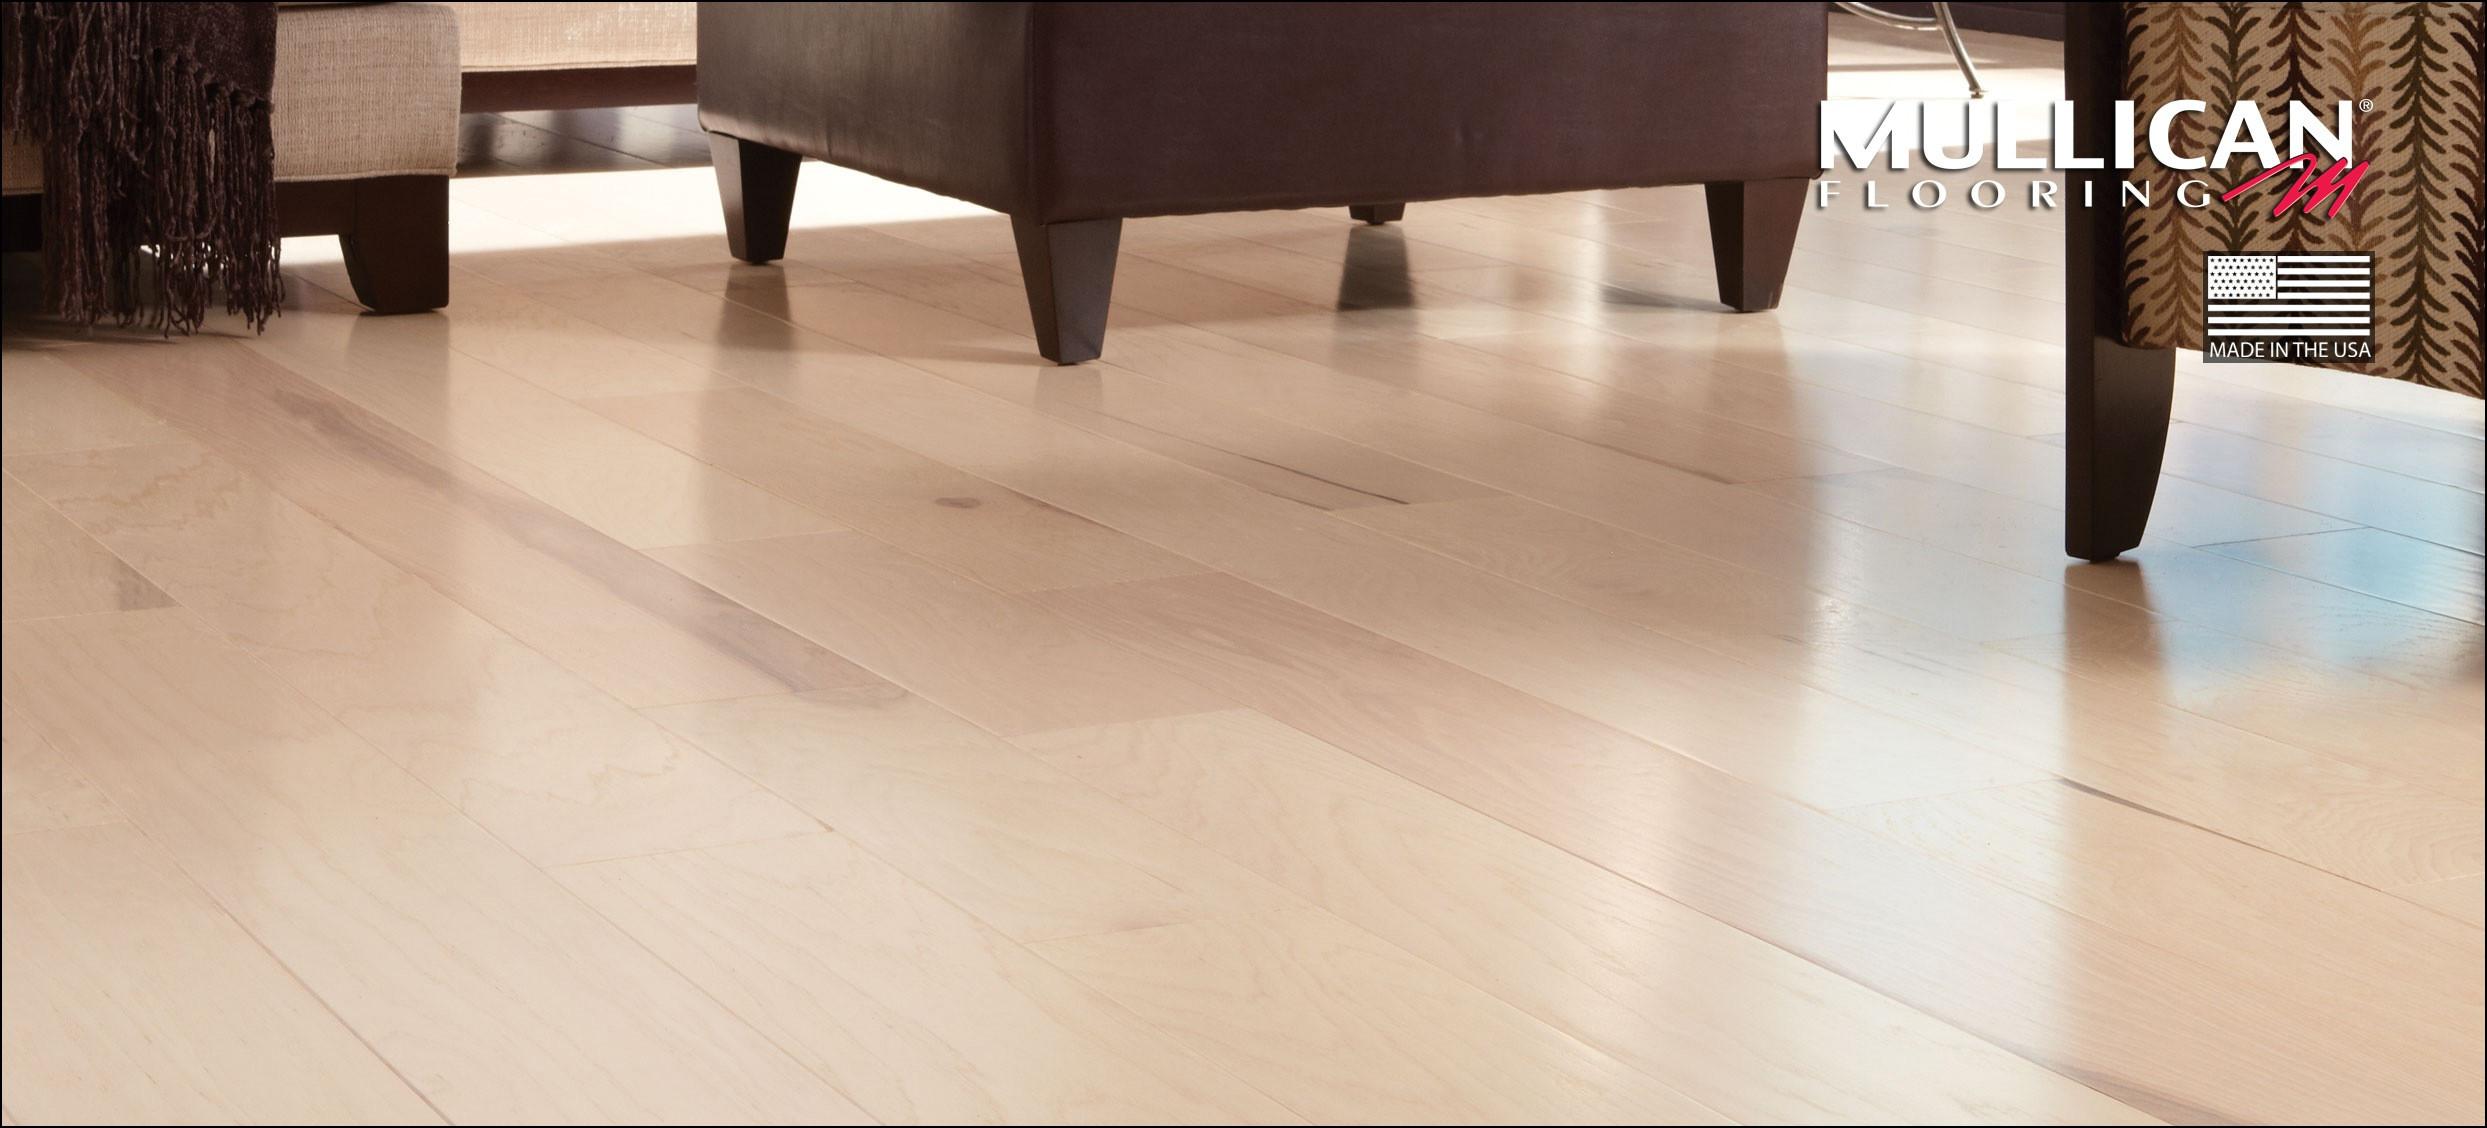 clearance hardwood flooring toronto of hardwood flooring suppliers france flooring ideas pertaining to hardwood flooring installation san diego mullican flooring home of hardwood flooring installation san diego